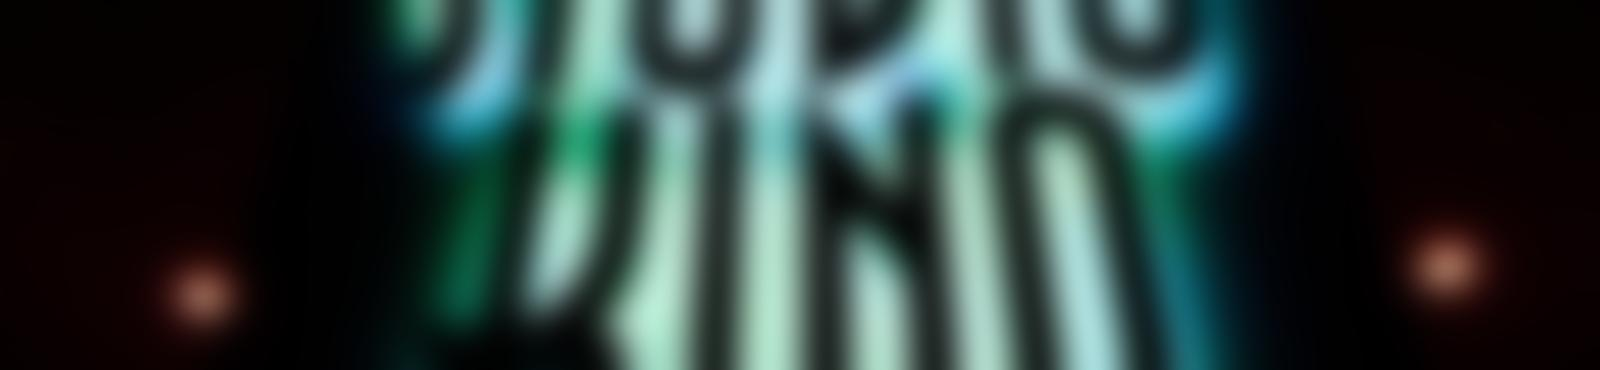 Blurred 0473b447 c42b 4bc5 9831 2c94c12851e5